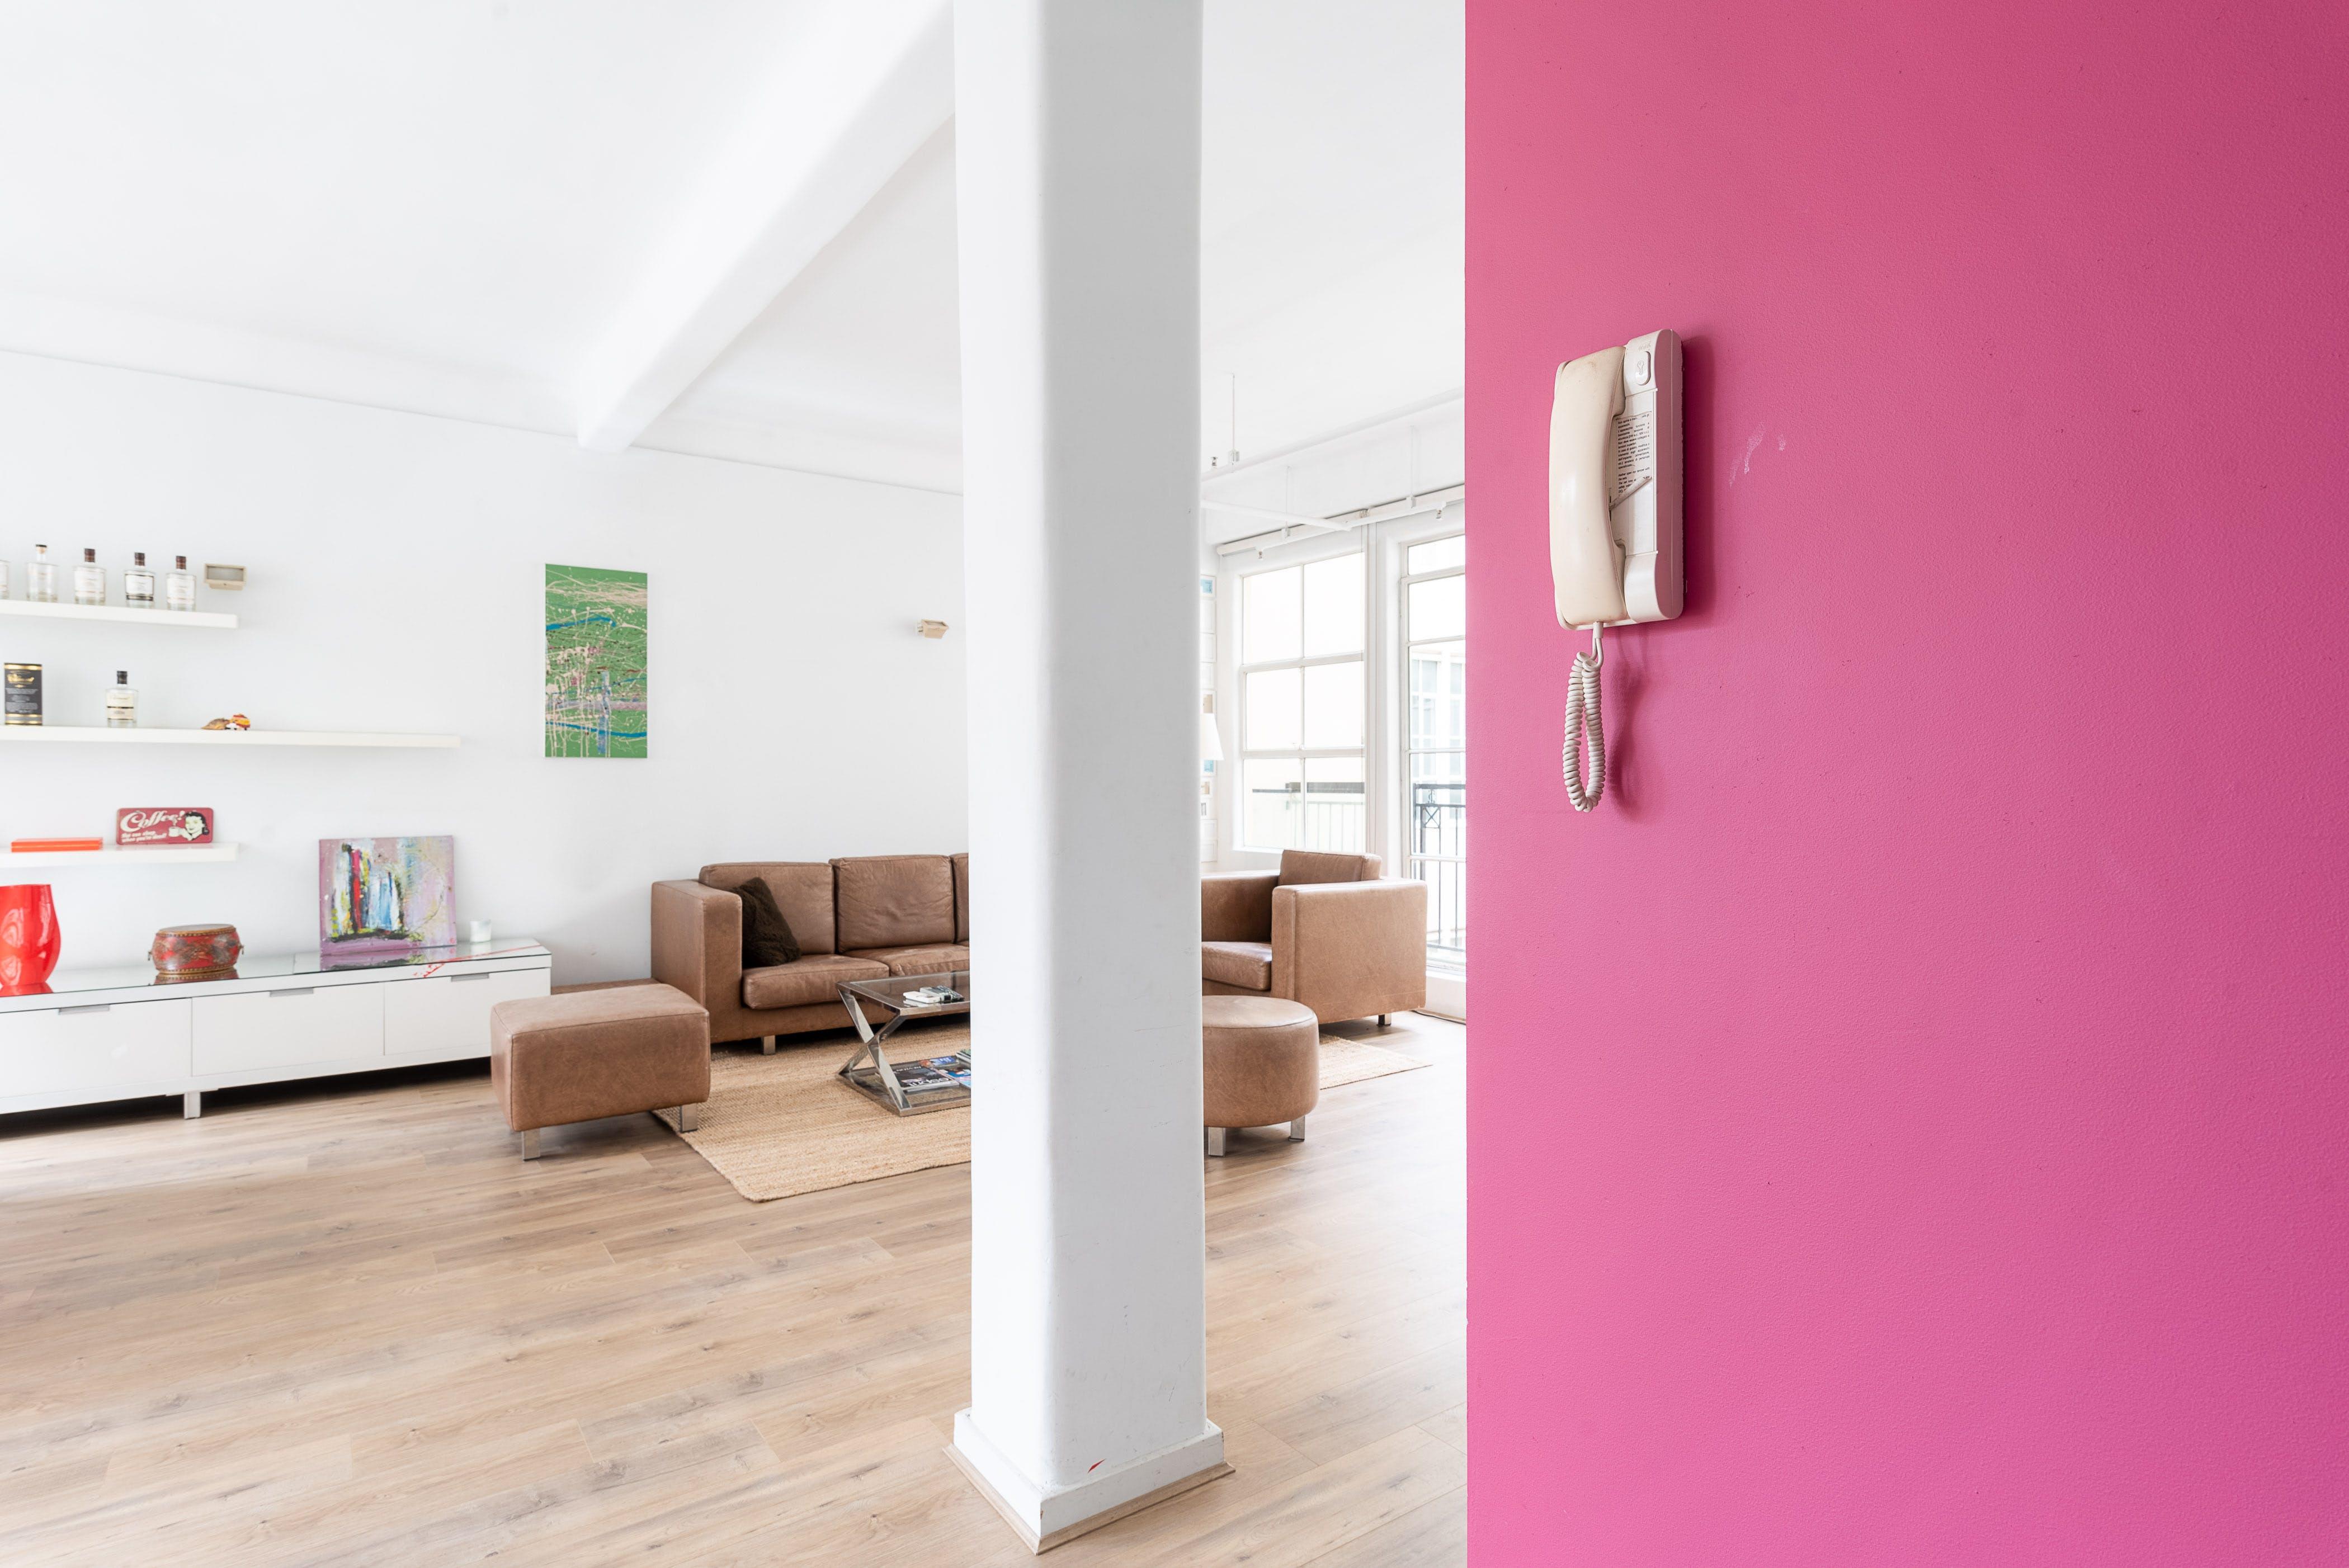 Le Salon, multi-use area at Le Petit Loft, image 3